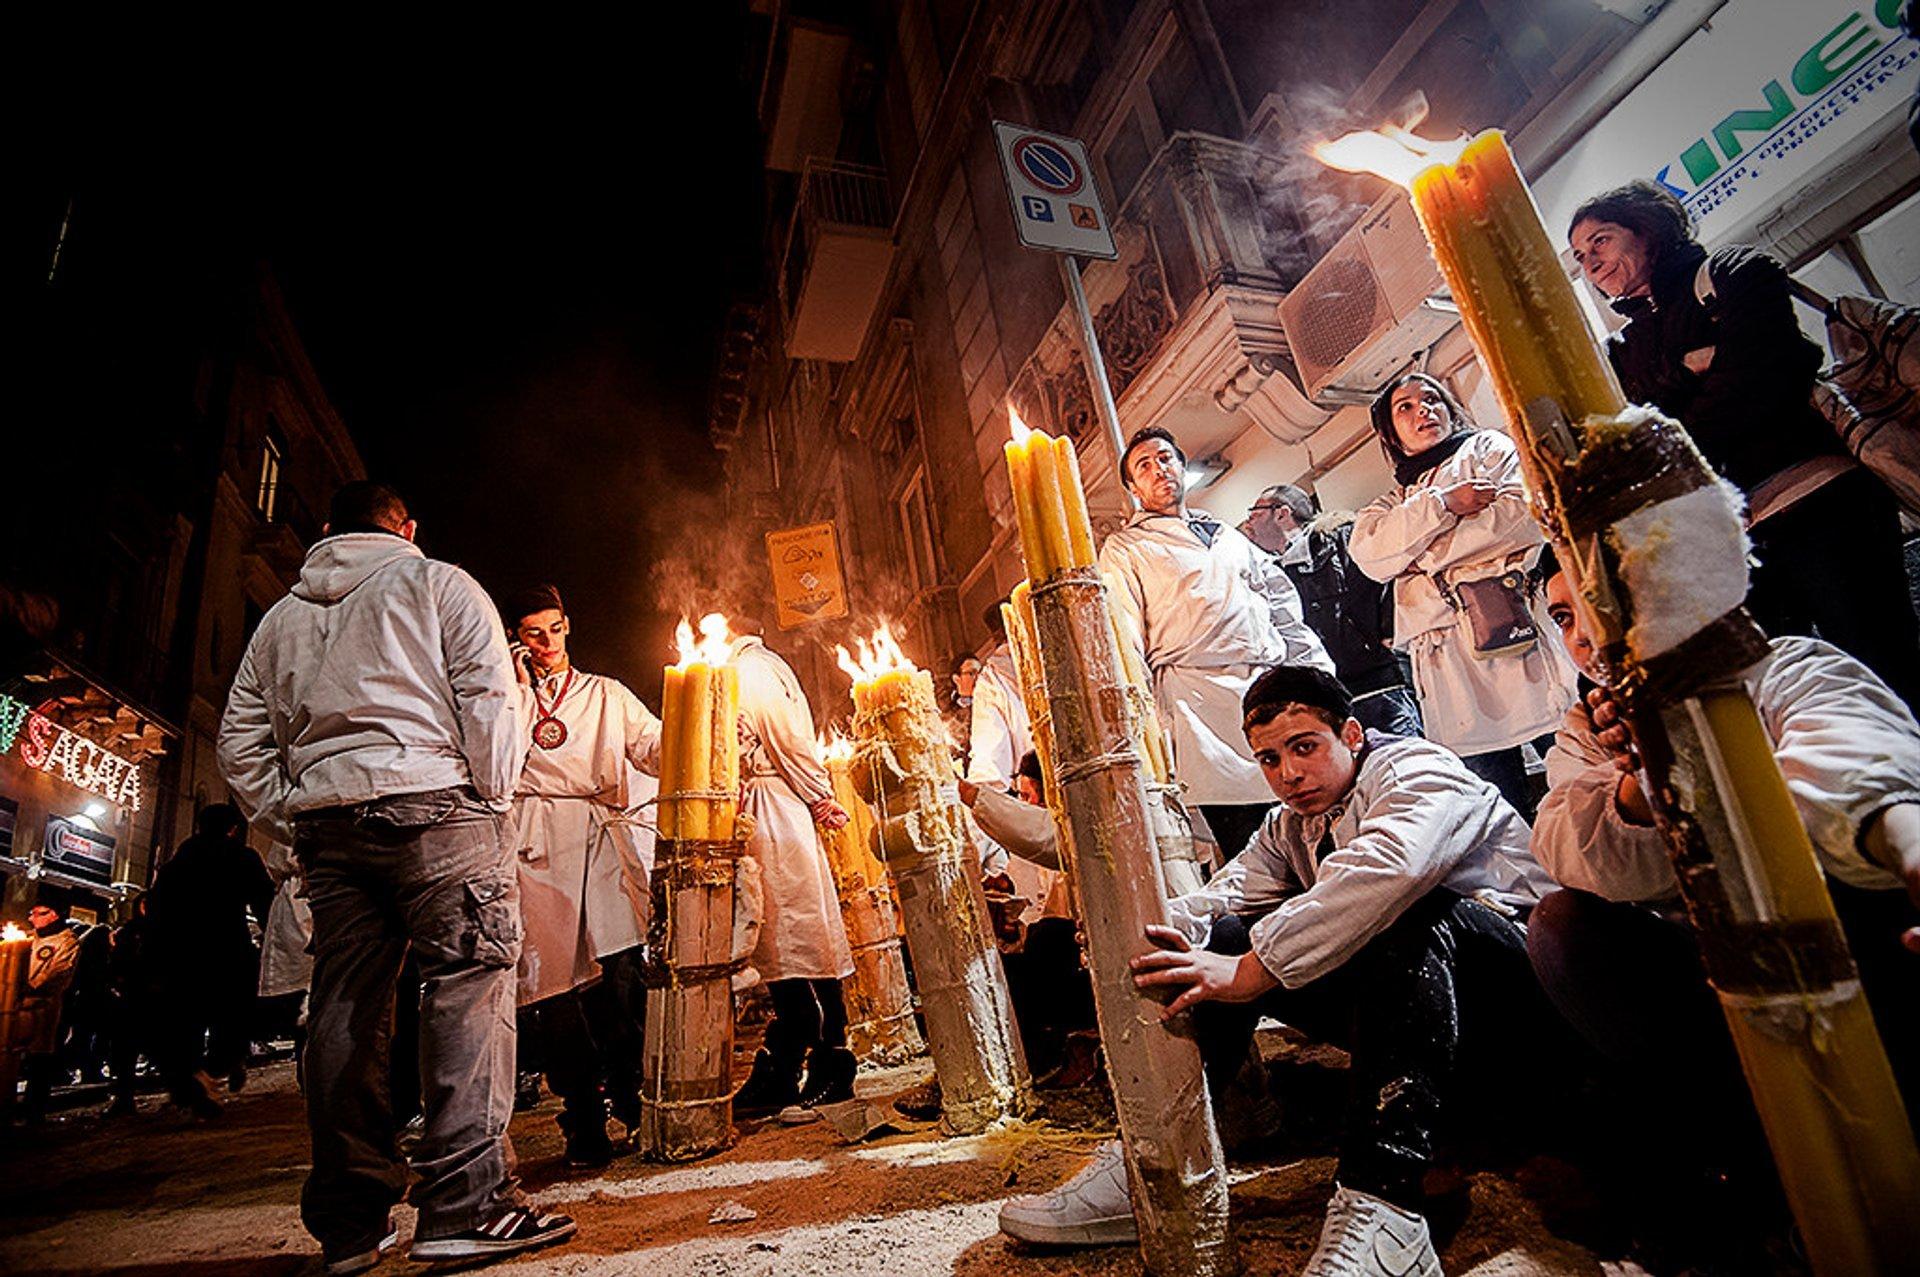 Saint Agata Festival in Sicily 2019 - Best Time